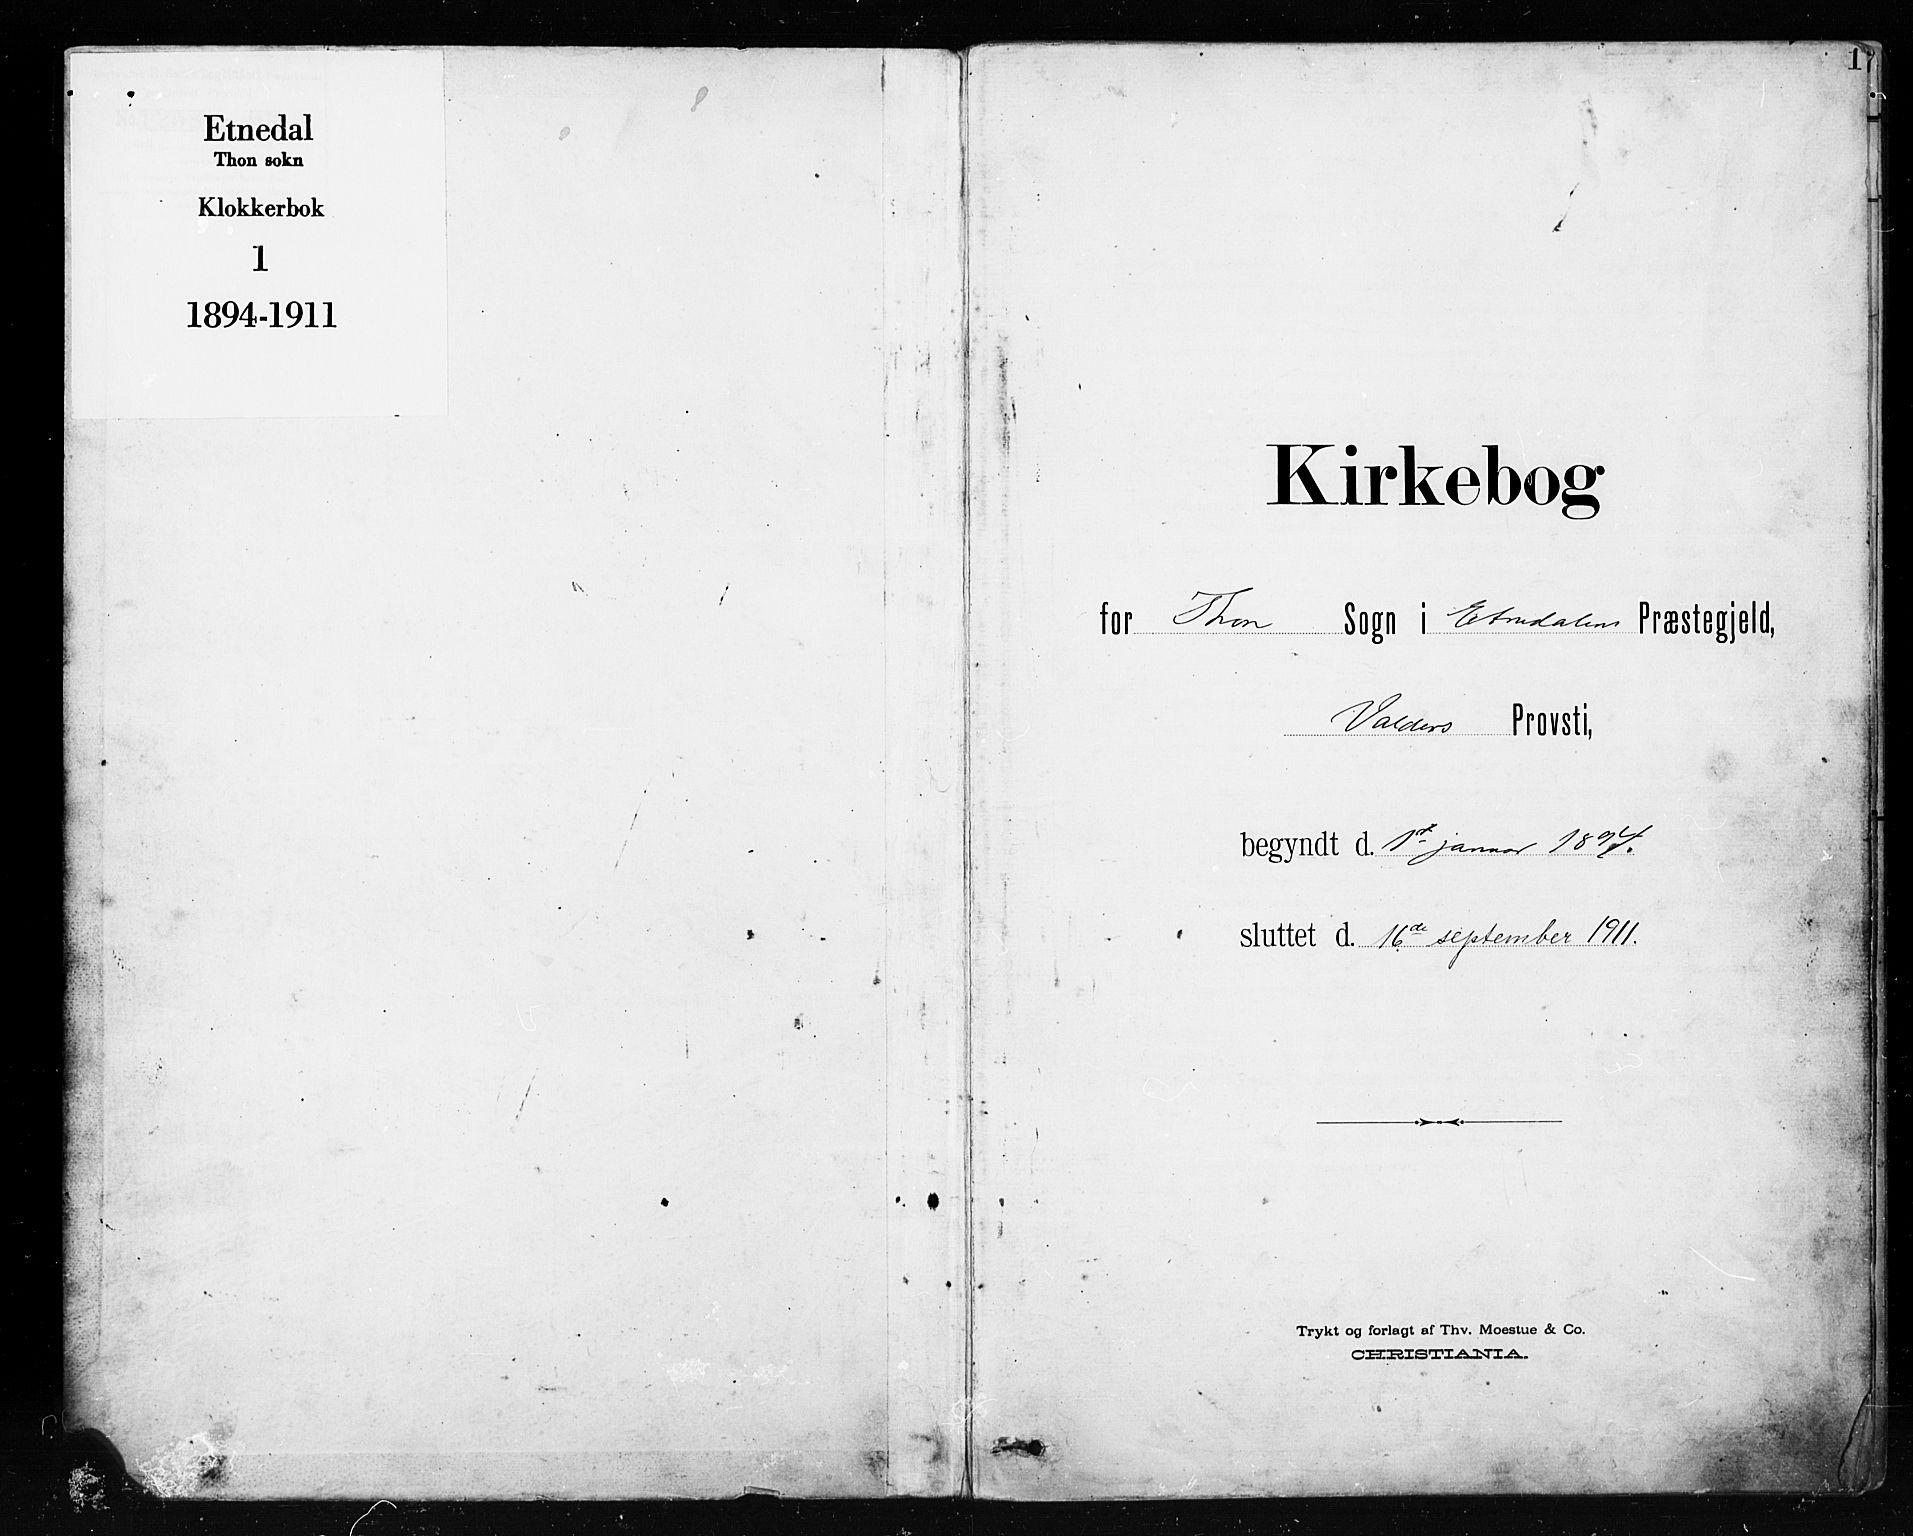 SAH, Etnedal prestekontor, H/Ha/Hab/Habb/L0001: Klokkerbok nr. II 1, 1894-1911, s. 0-1